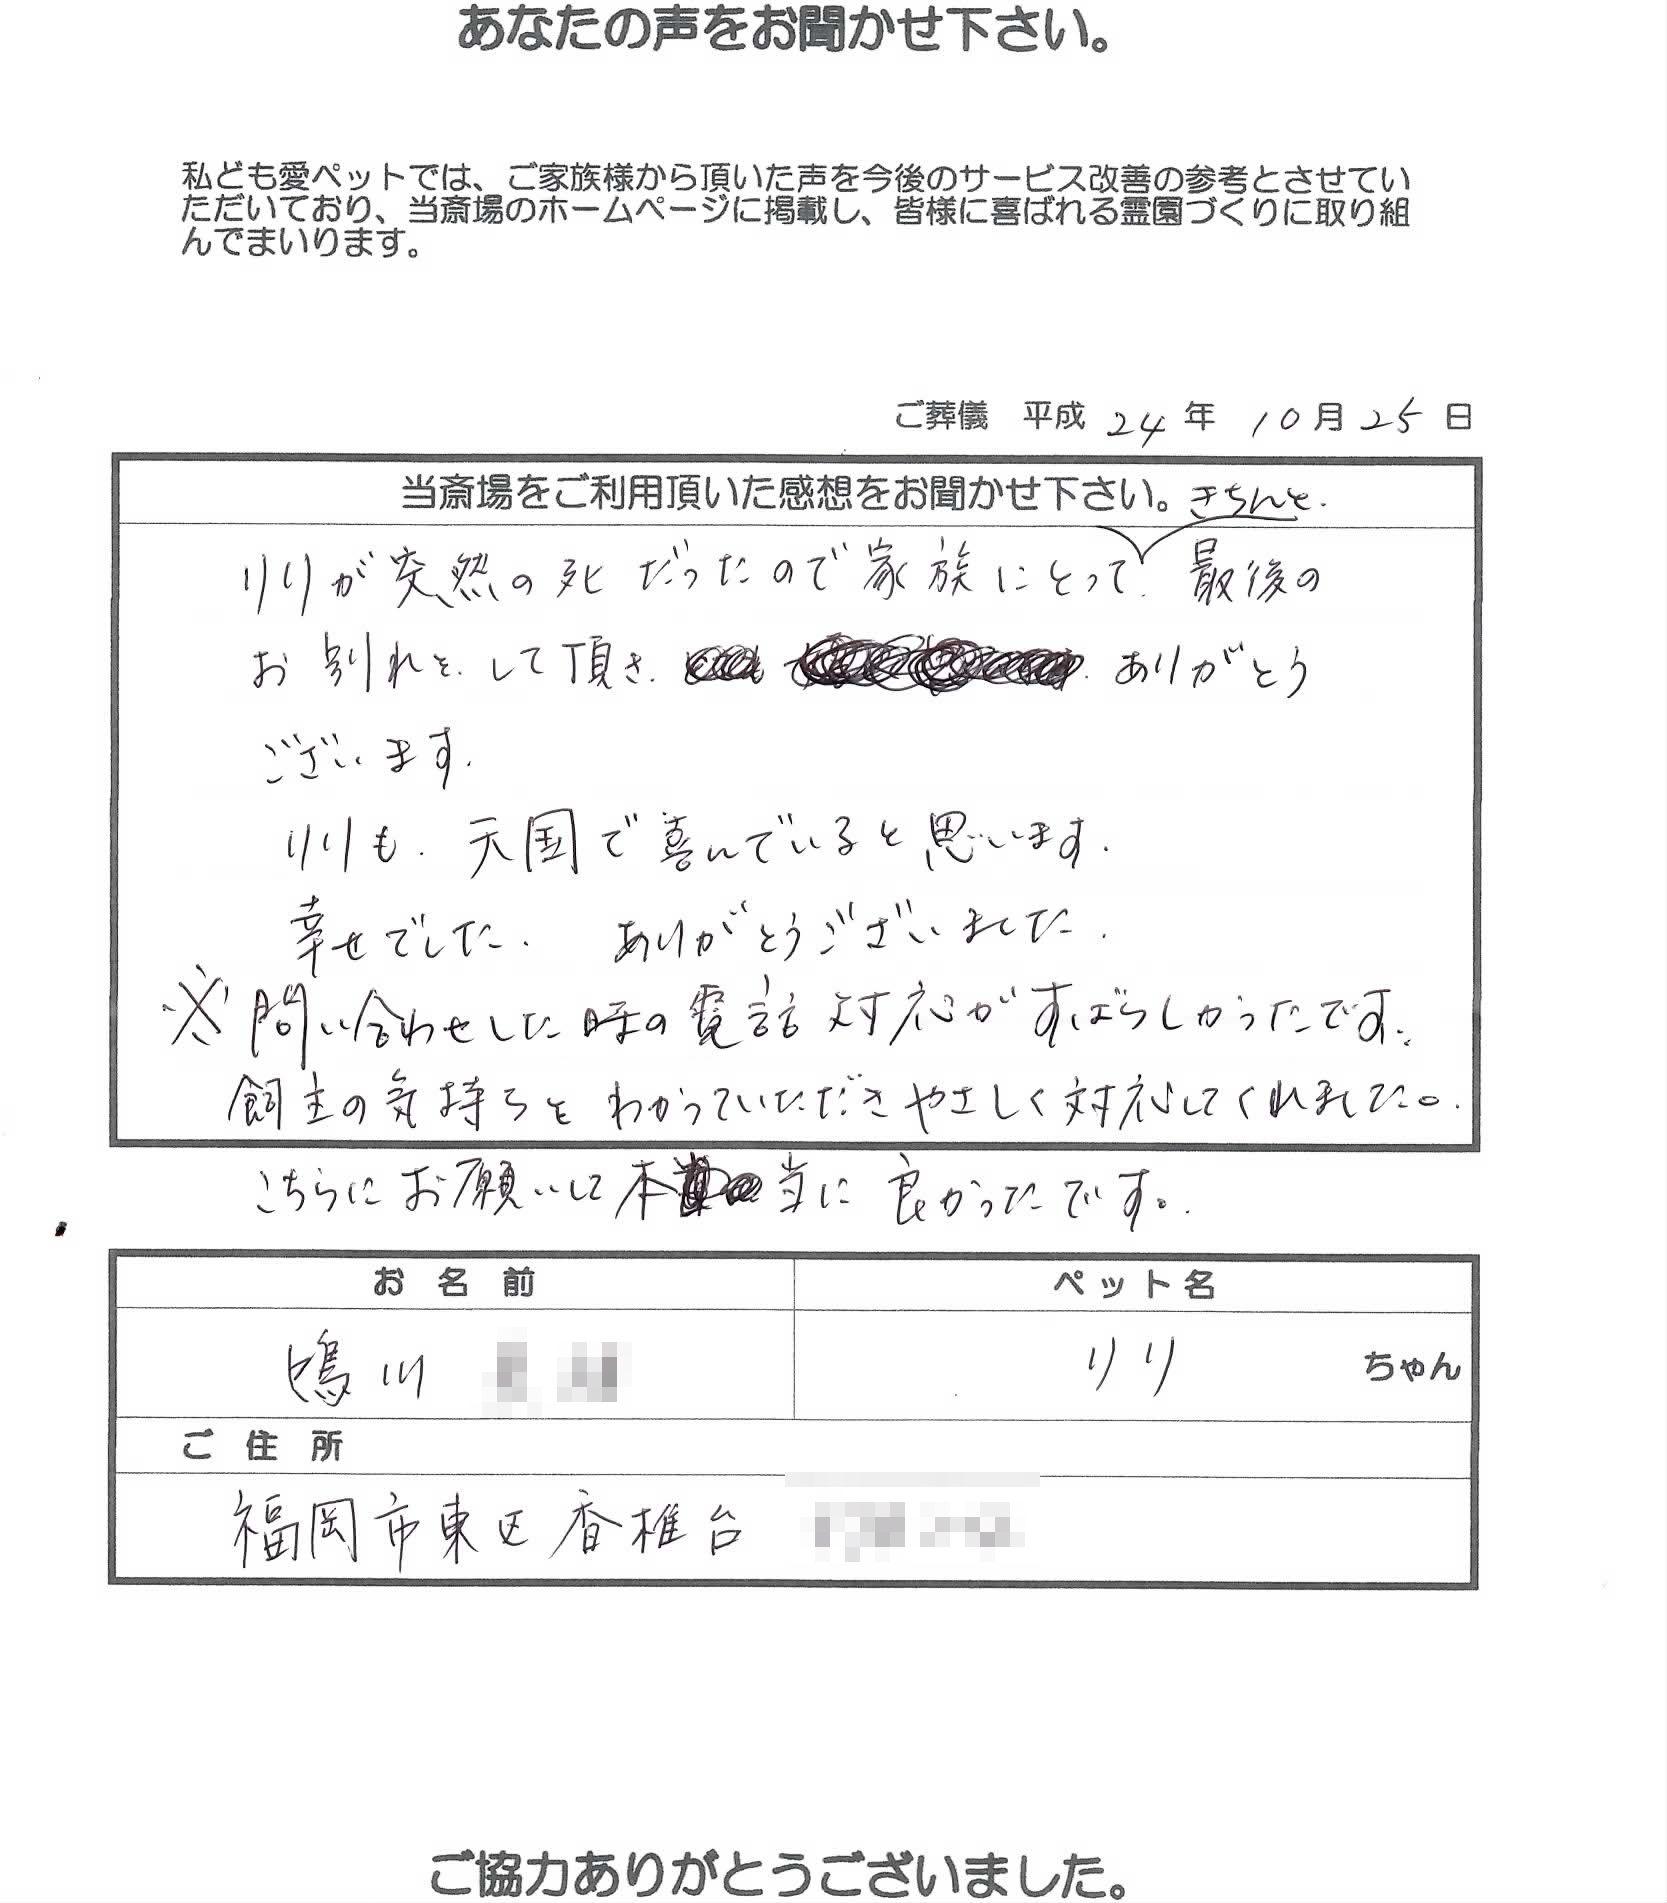 k121025-1.jpg